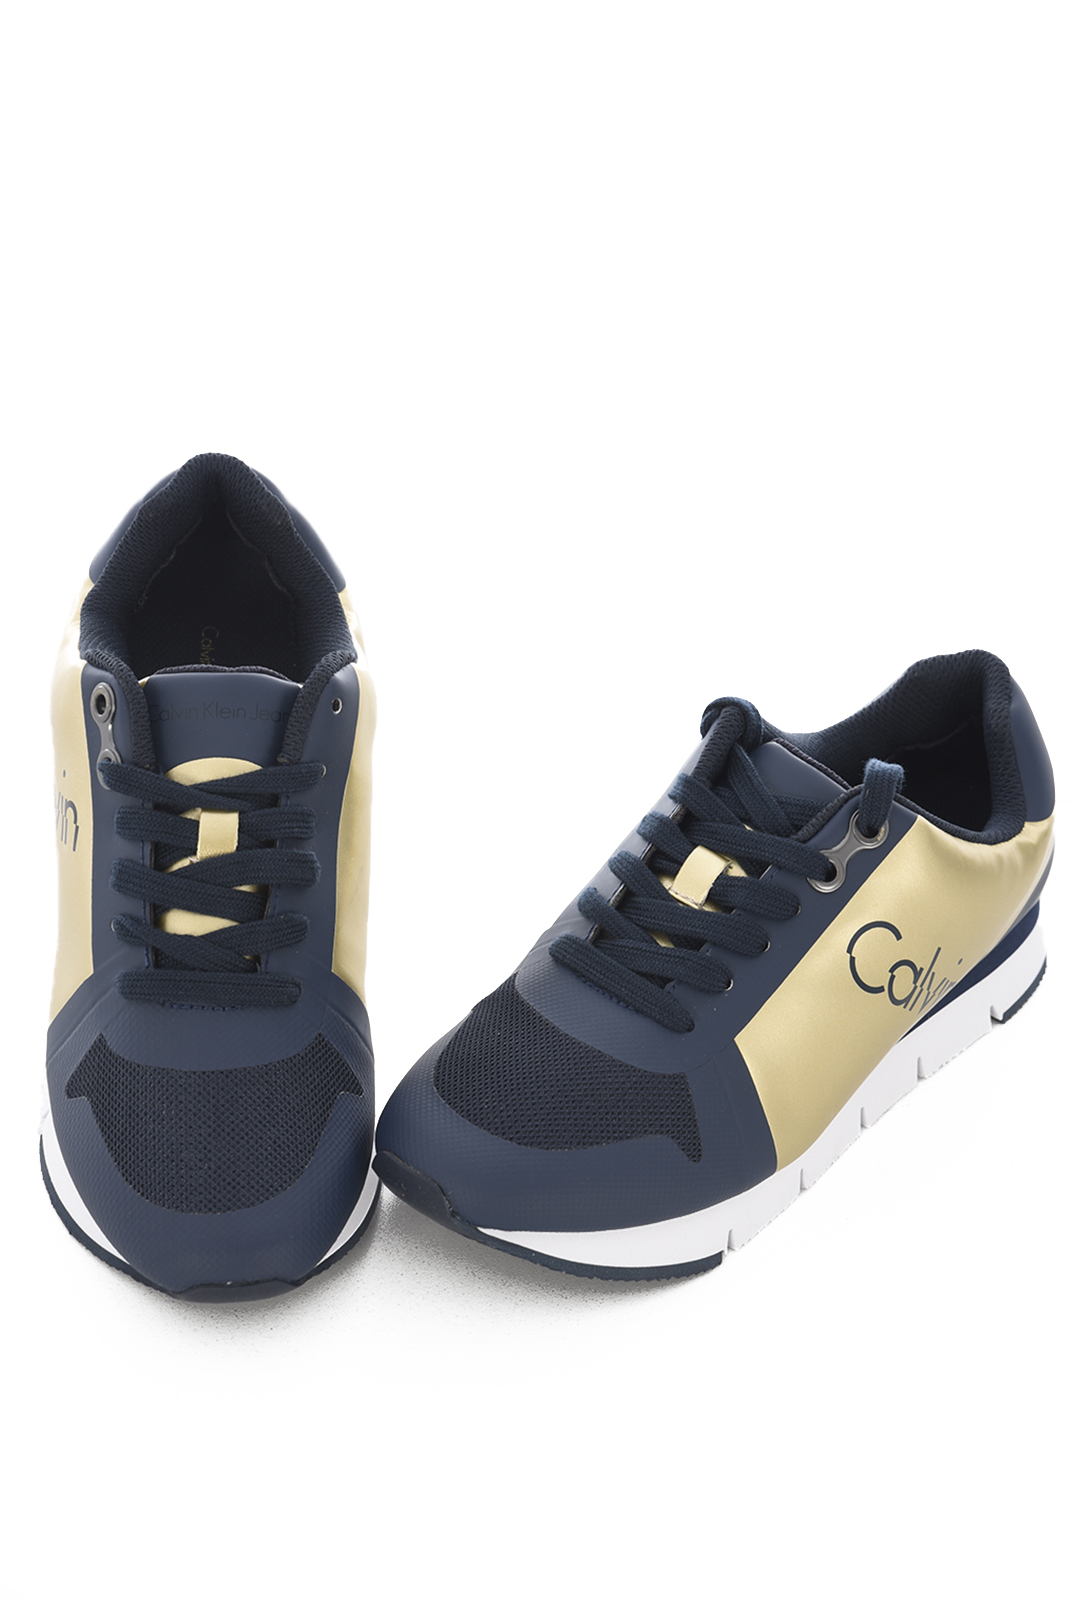 Baskets / Sneakers  Calvin klein TALINE METAL SMOOTH GOLD/INDIGO